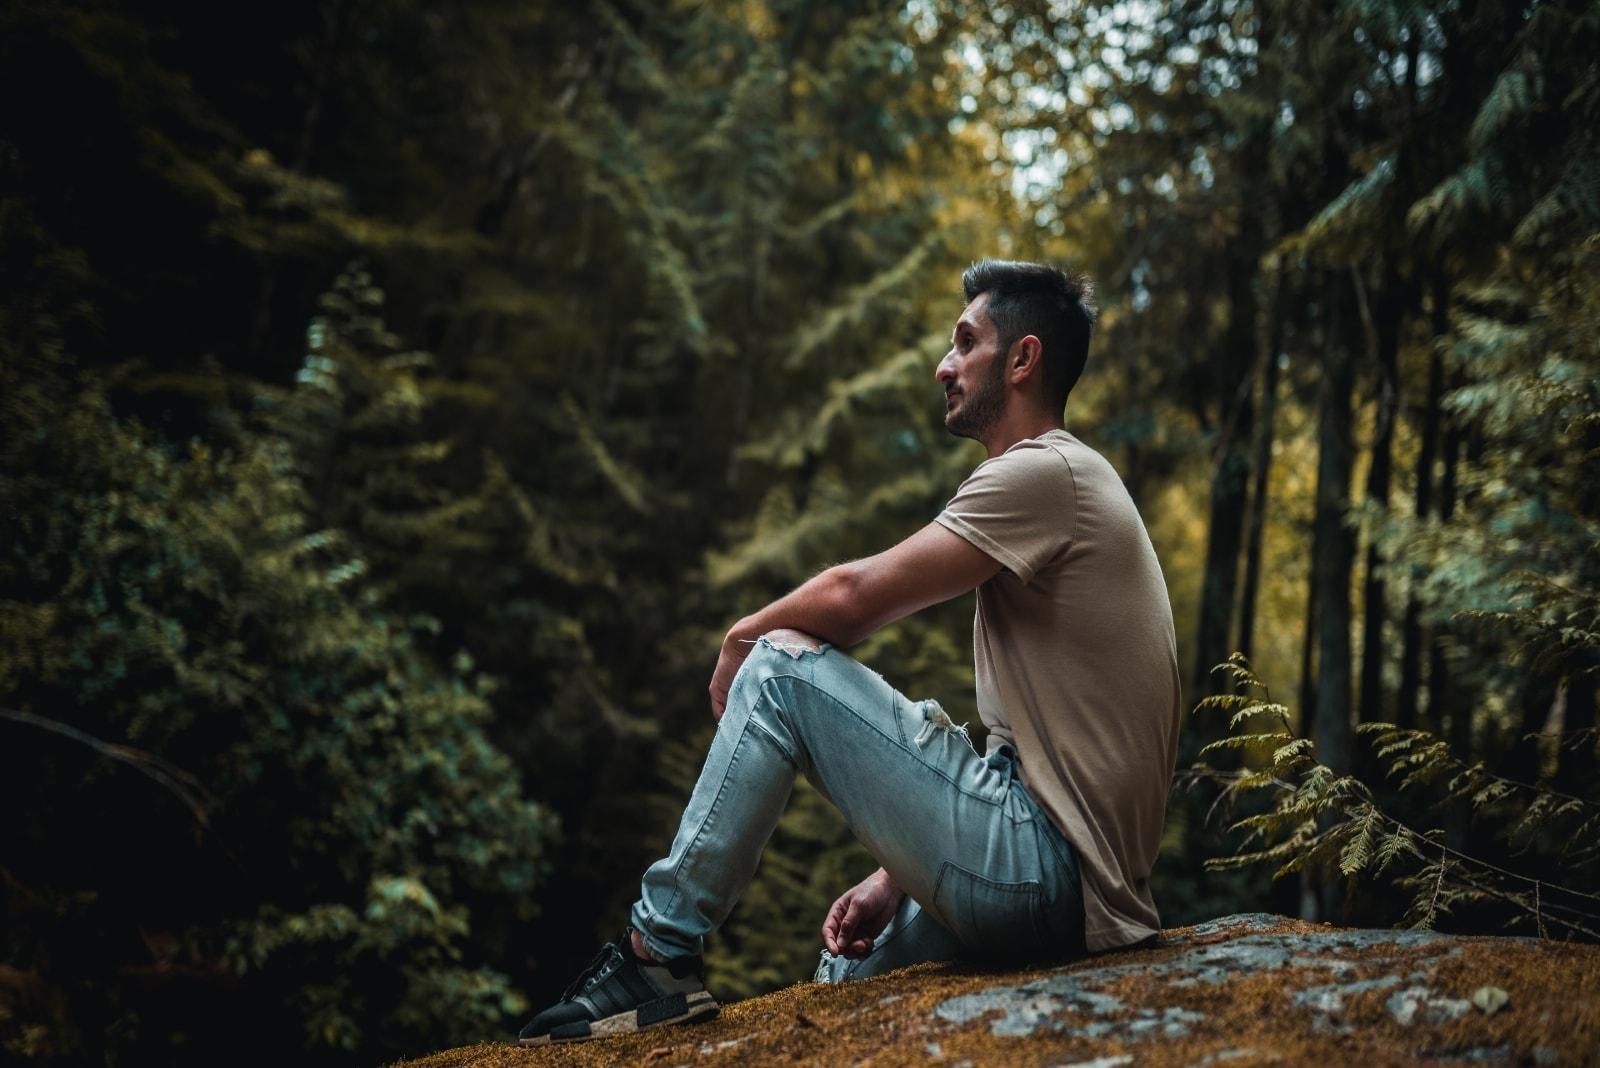 man sitting on ground near trees